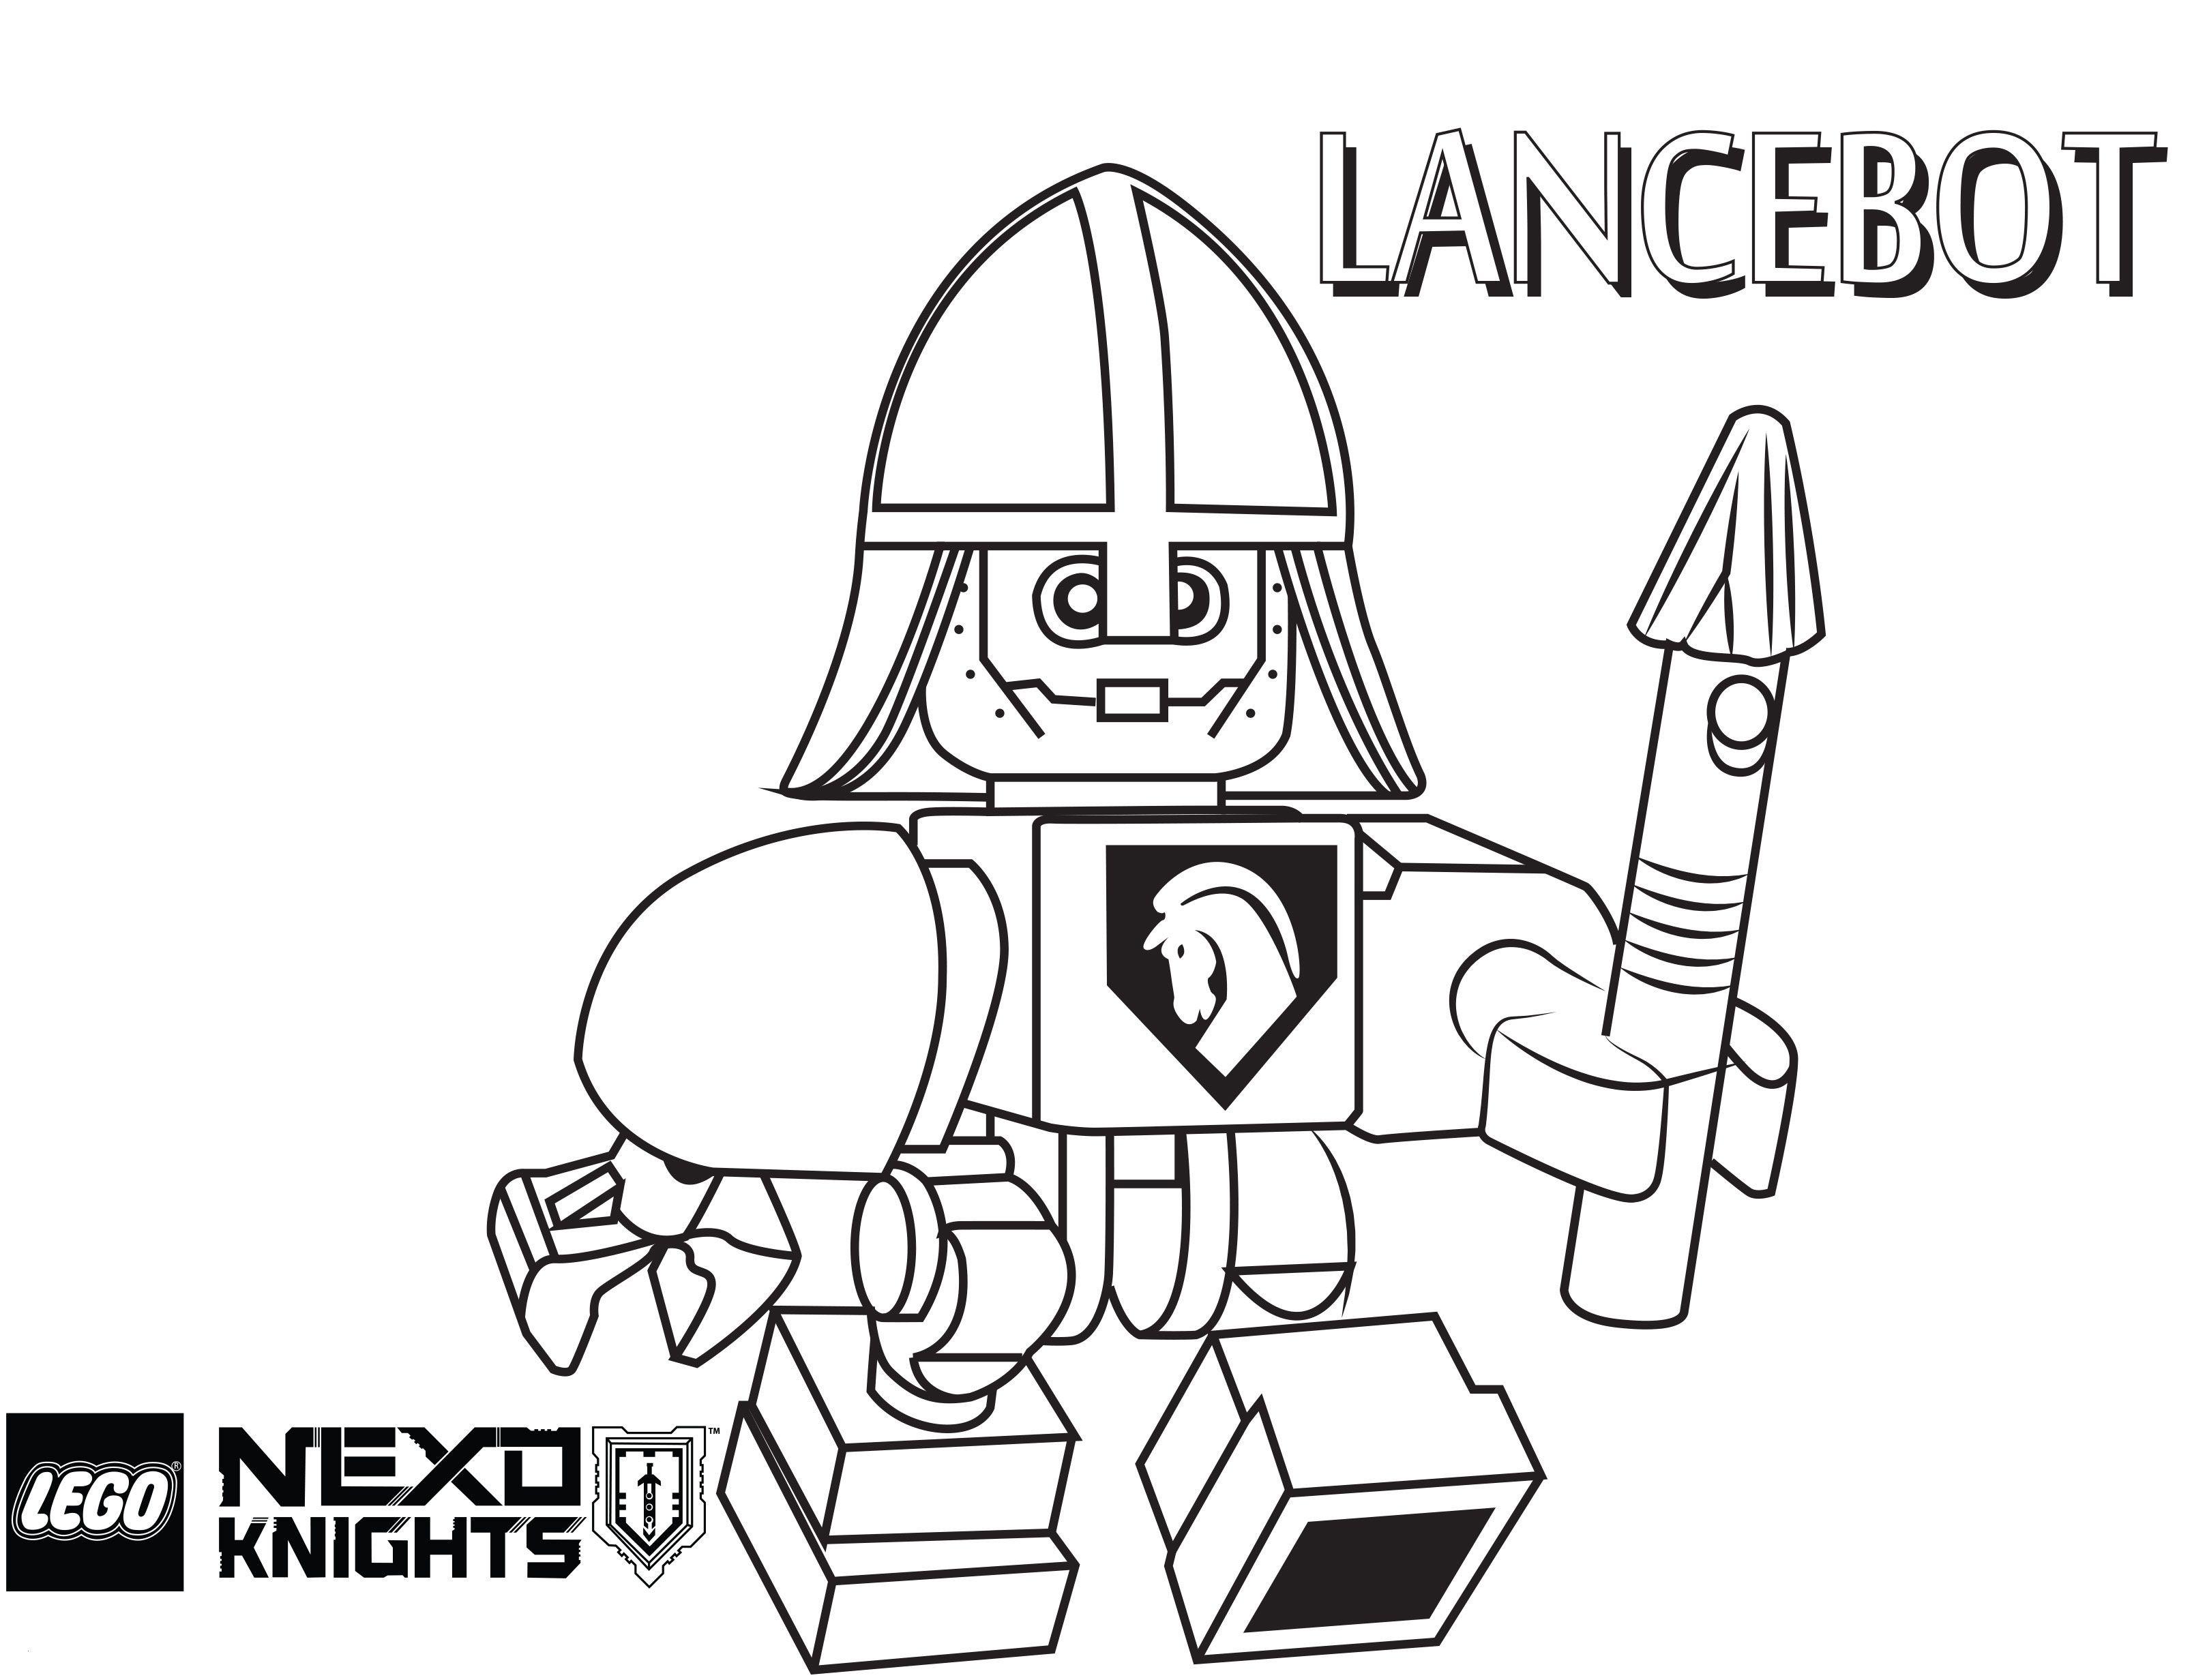 coole ausmalbilder graffiti neu lego nexo knights coloring